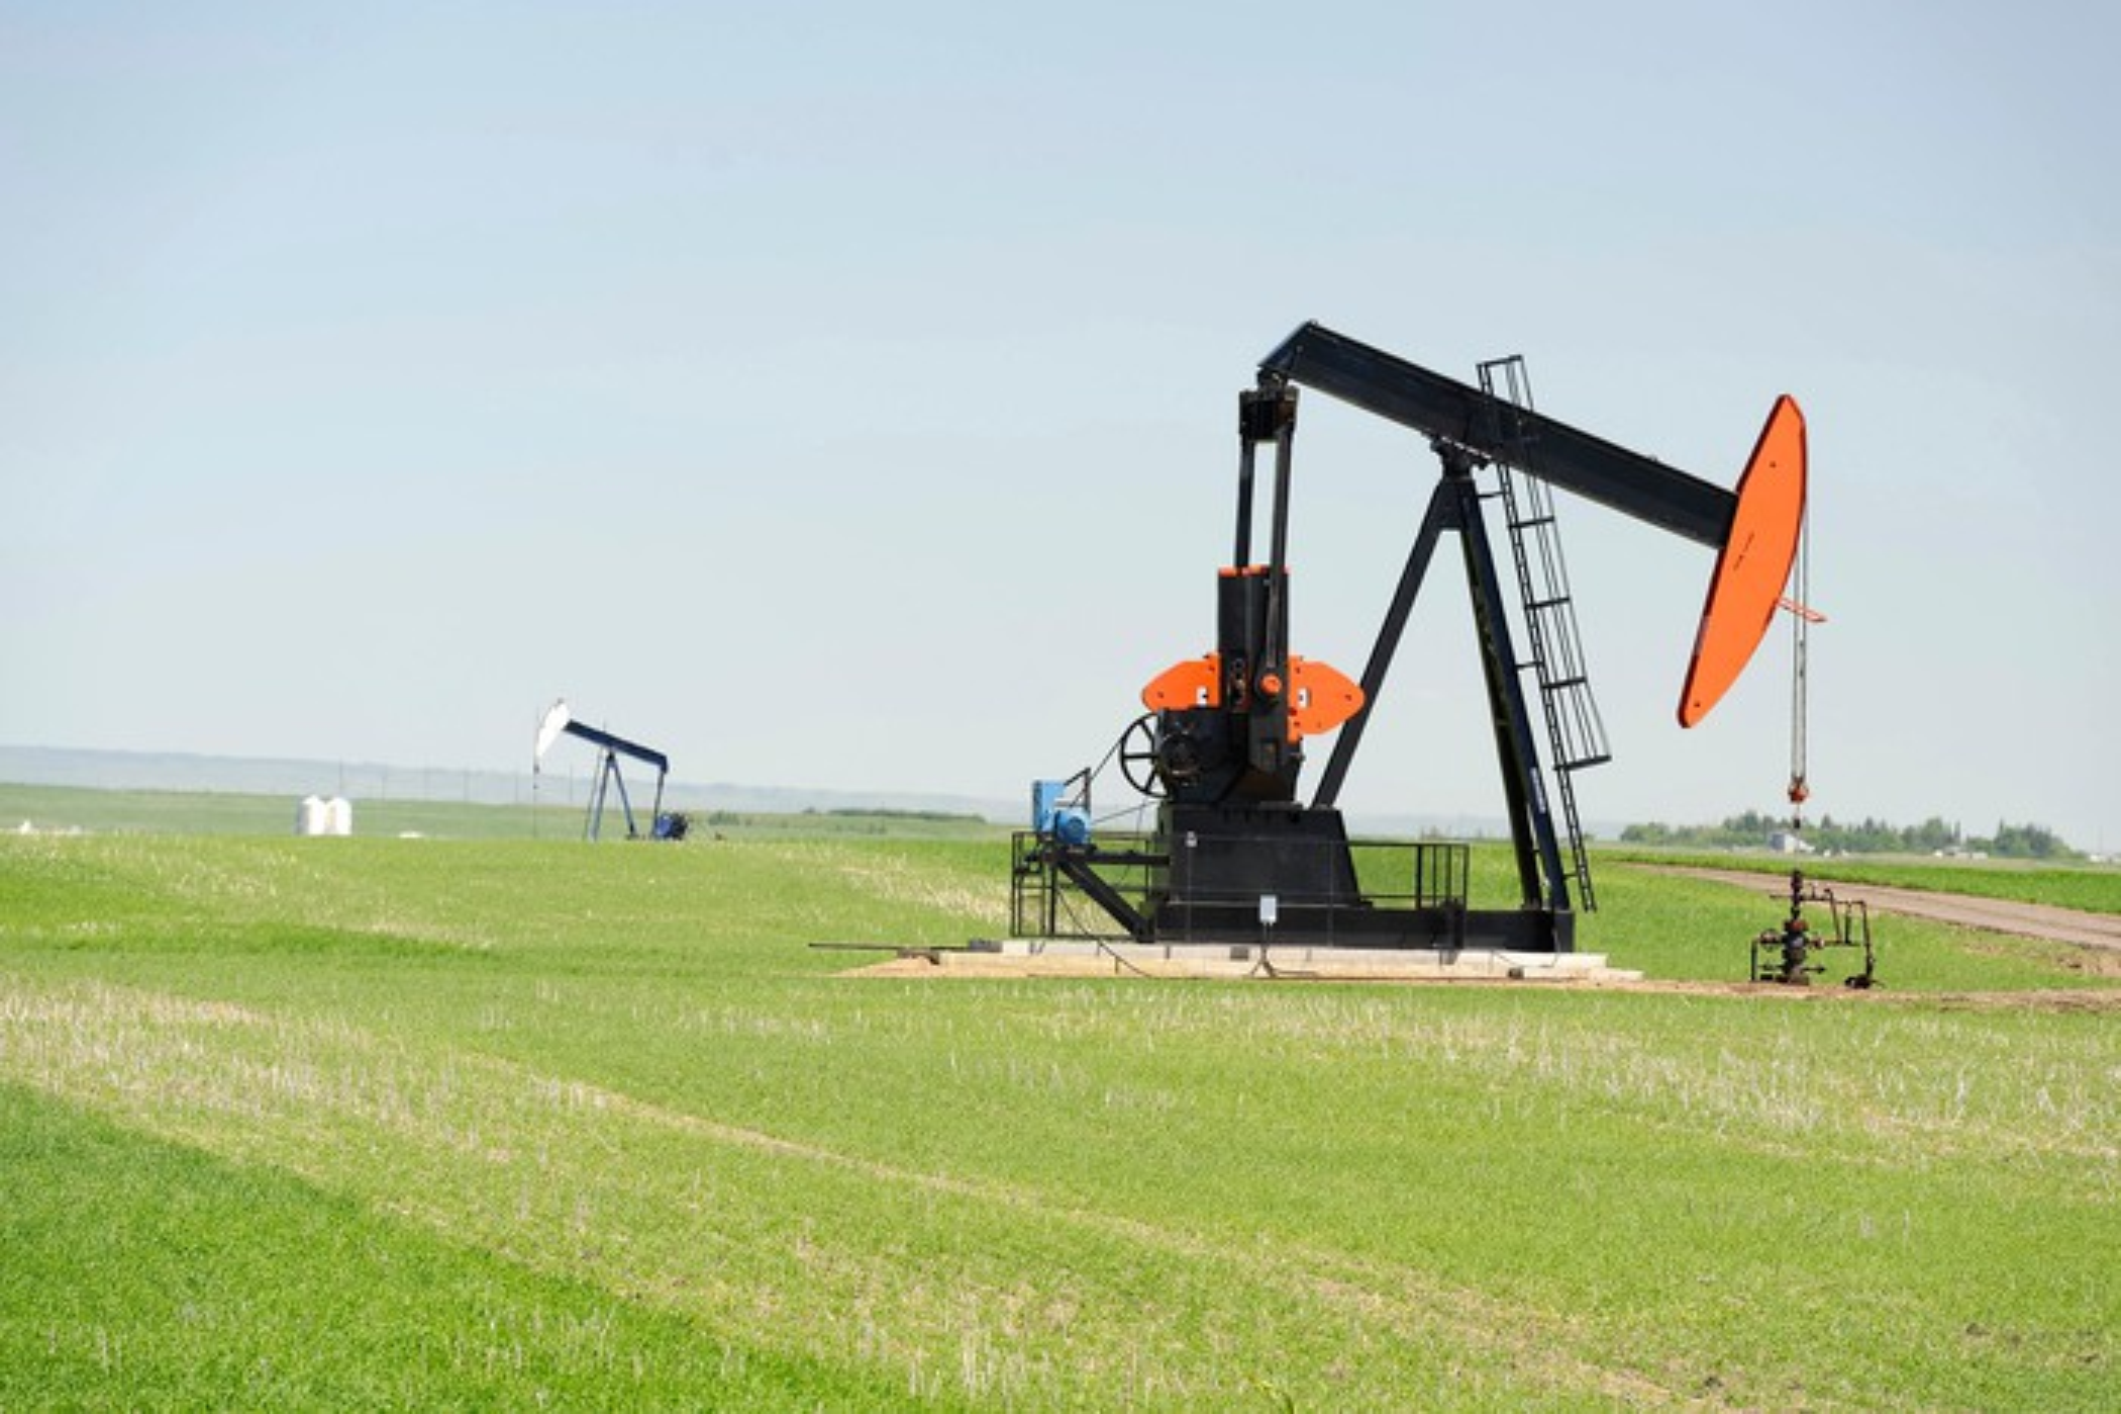 An oil pump in a green field.